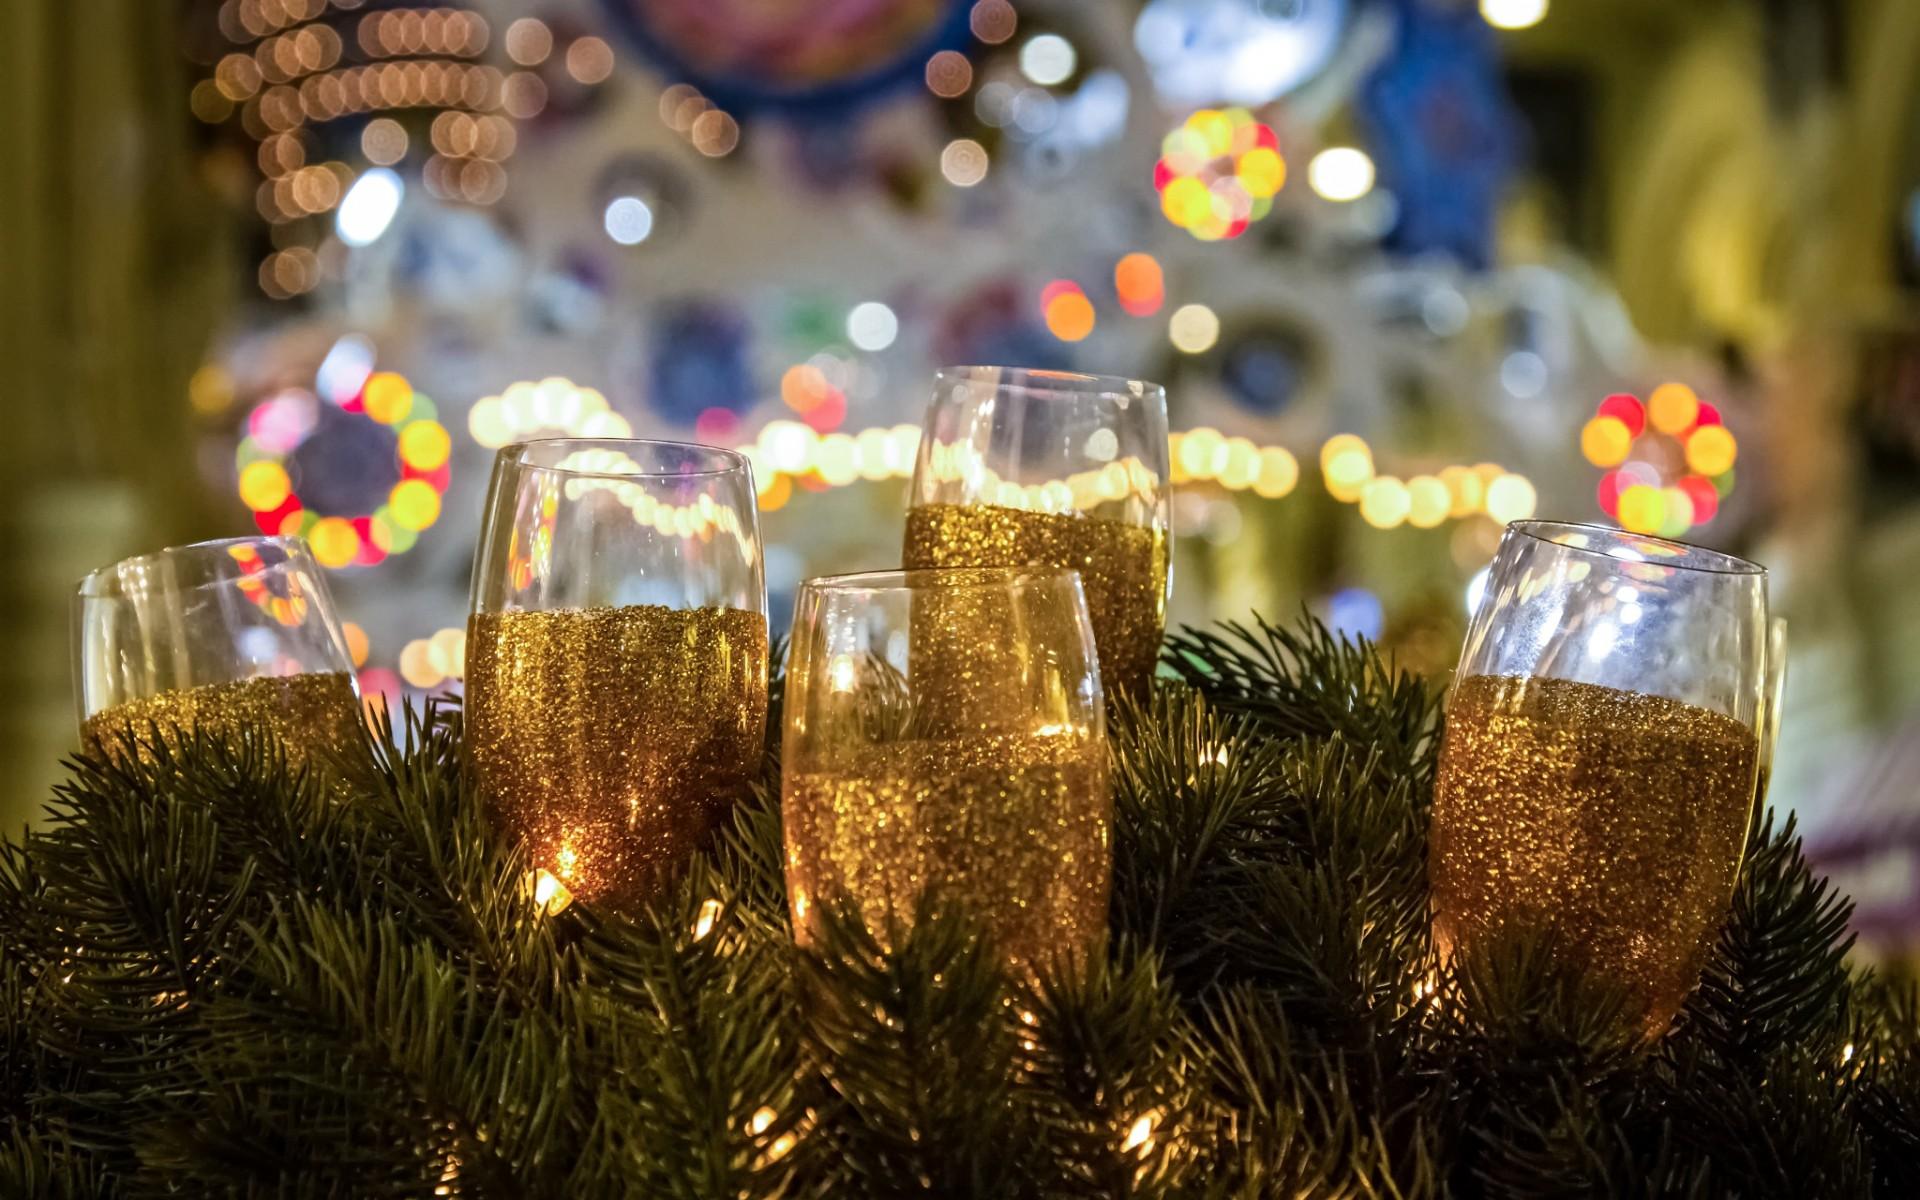 С наступающим новым годом фото картинки - C наступающим новым годом 2017 поздравительные картинки